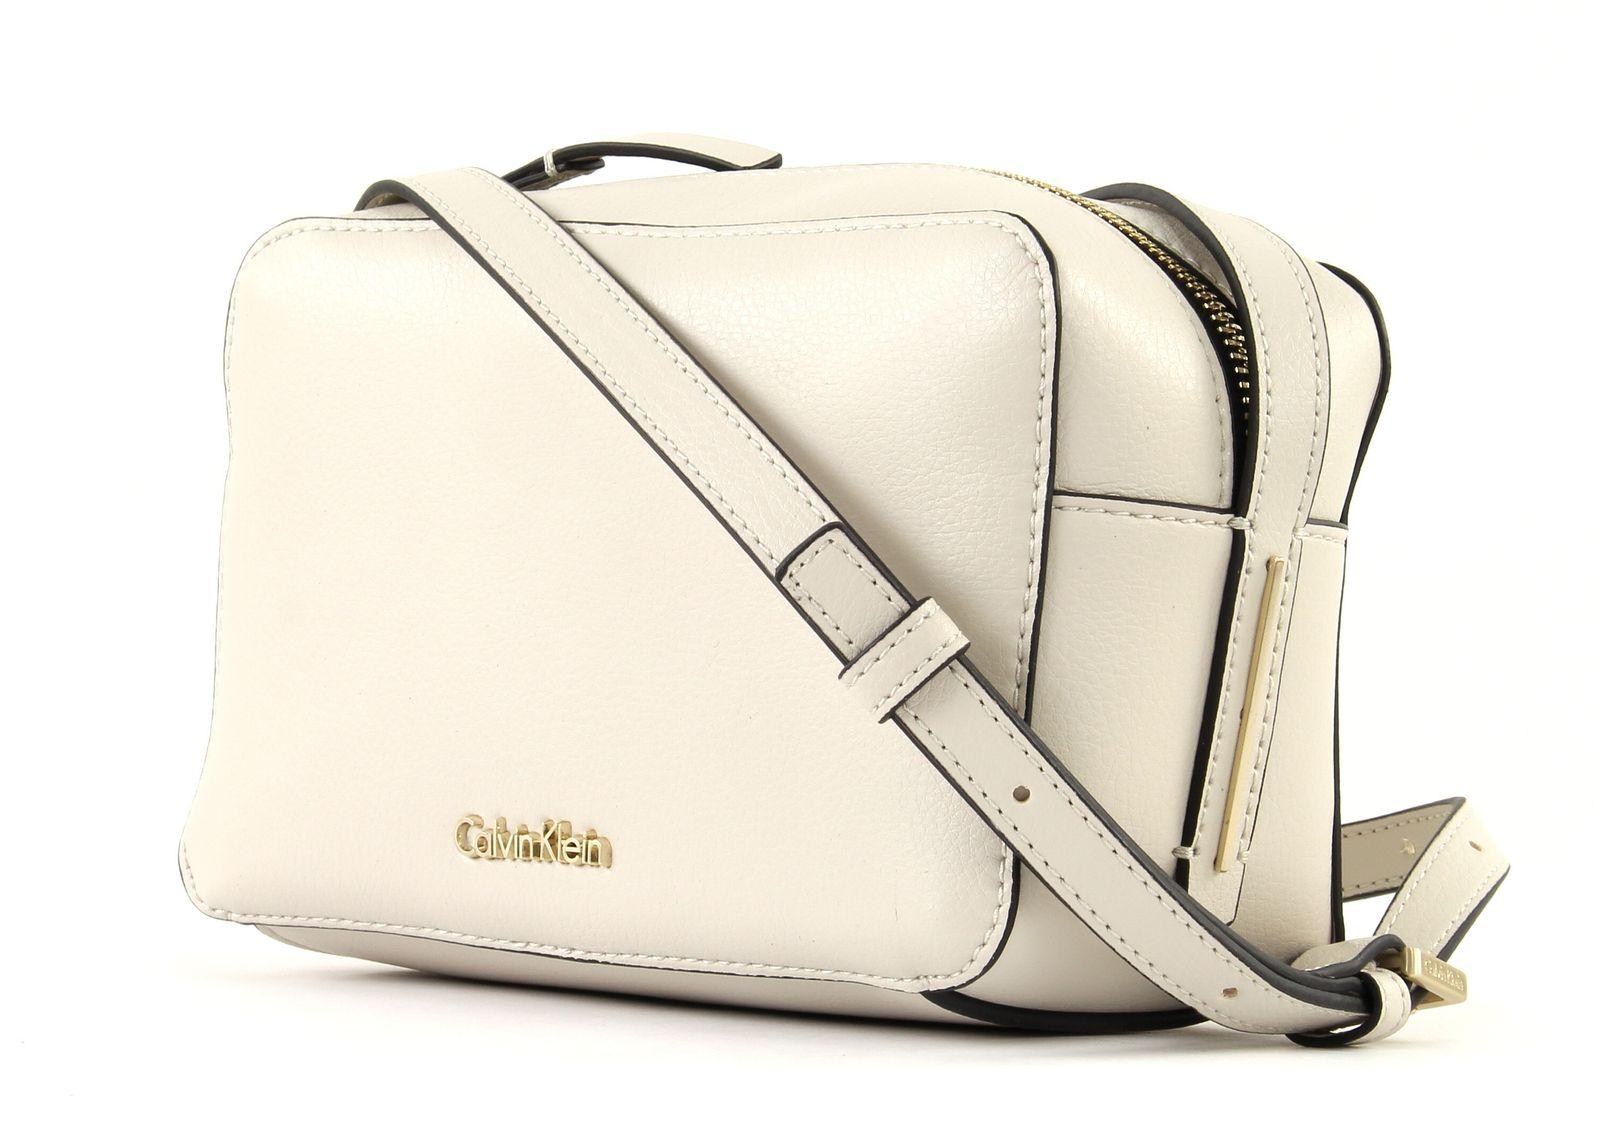 Frame Camera Bag Cement Calvin Klein mWzTnHf